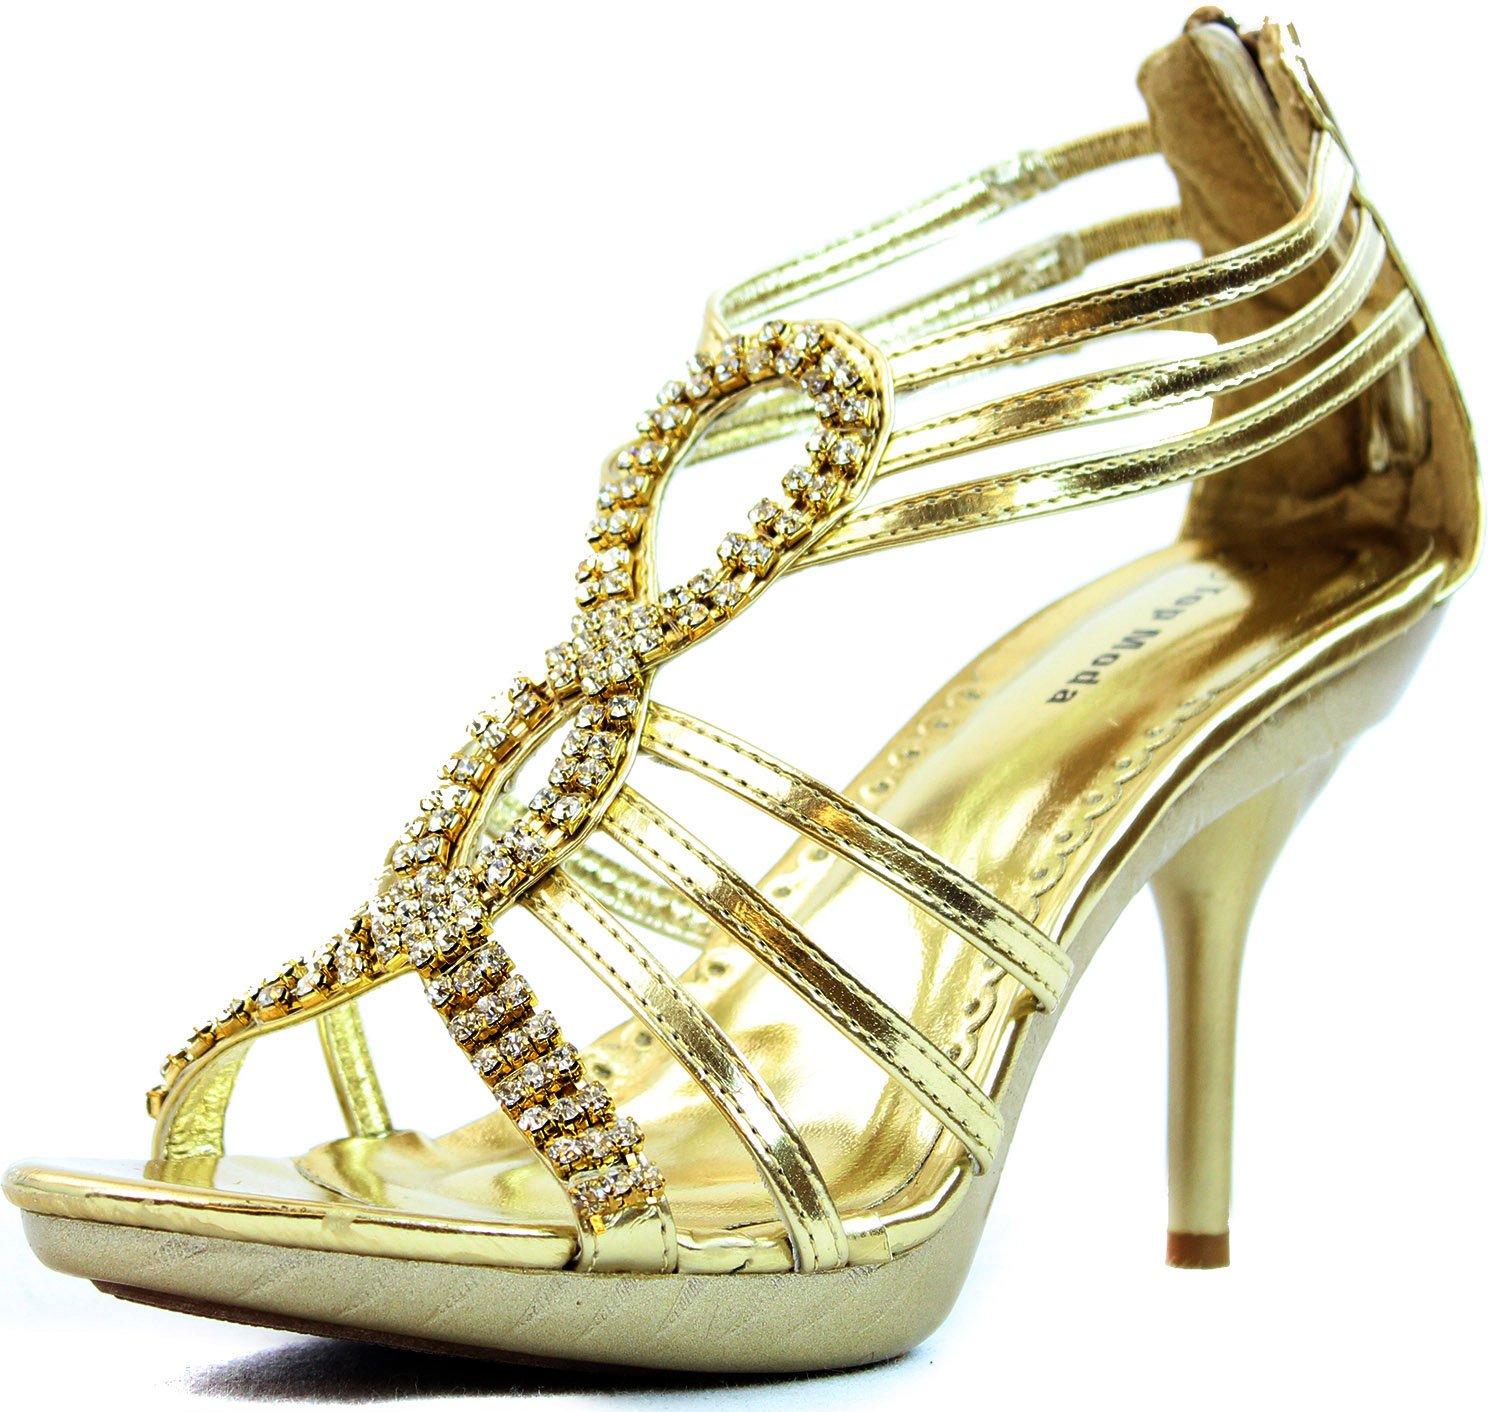 Top Moda Women's Fine-72 Gold Color Rhinestone Evening Shoes, Gold, 6